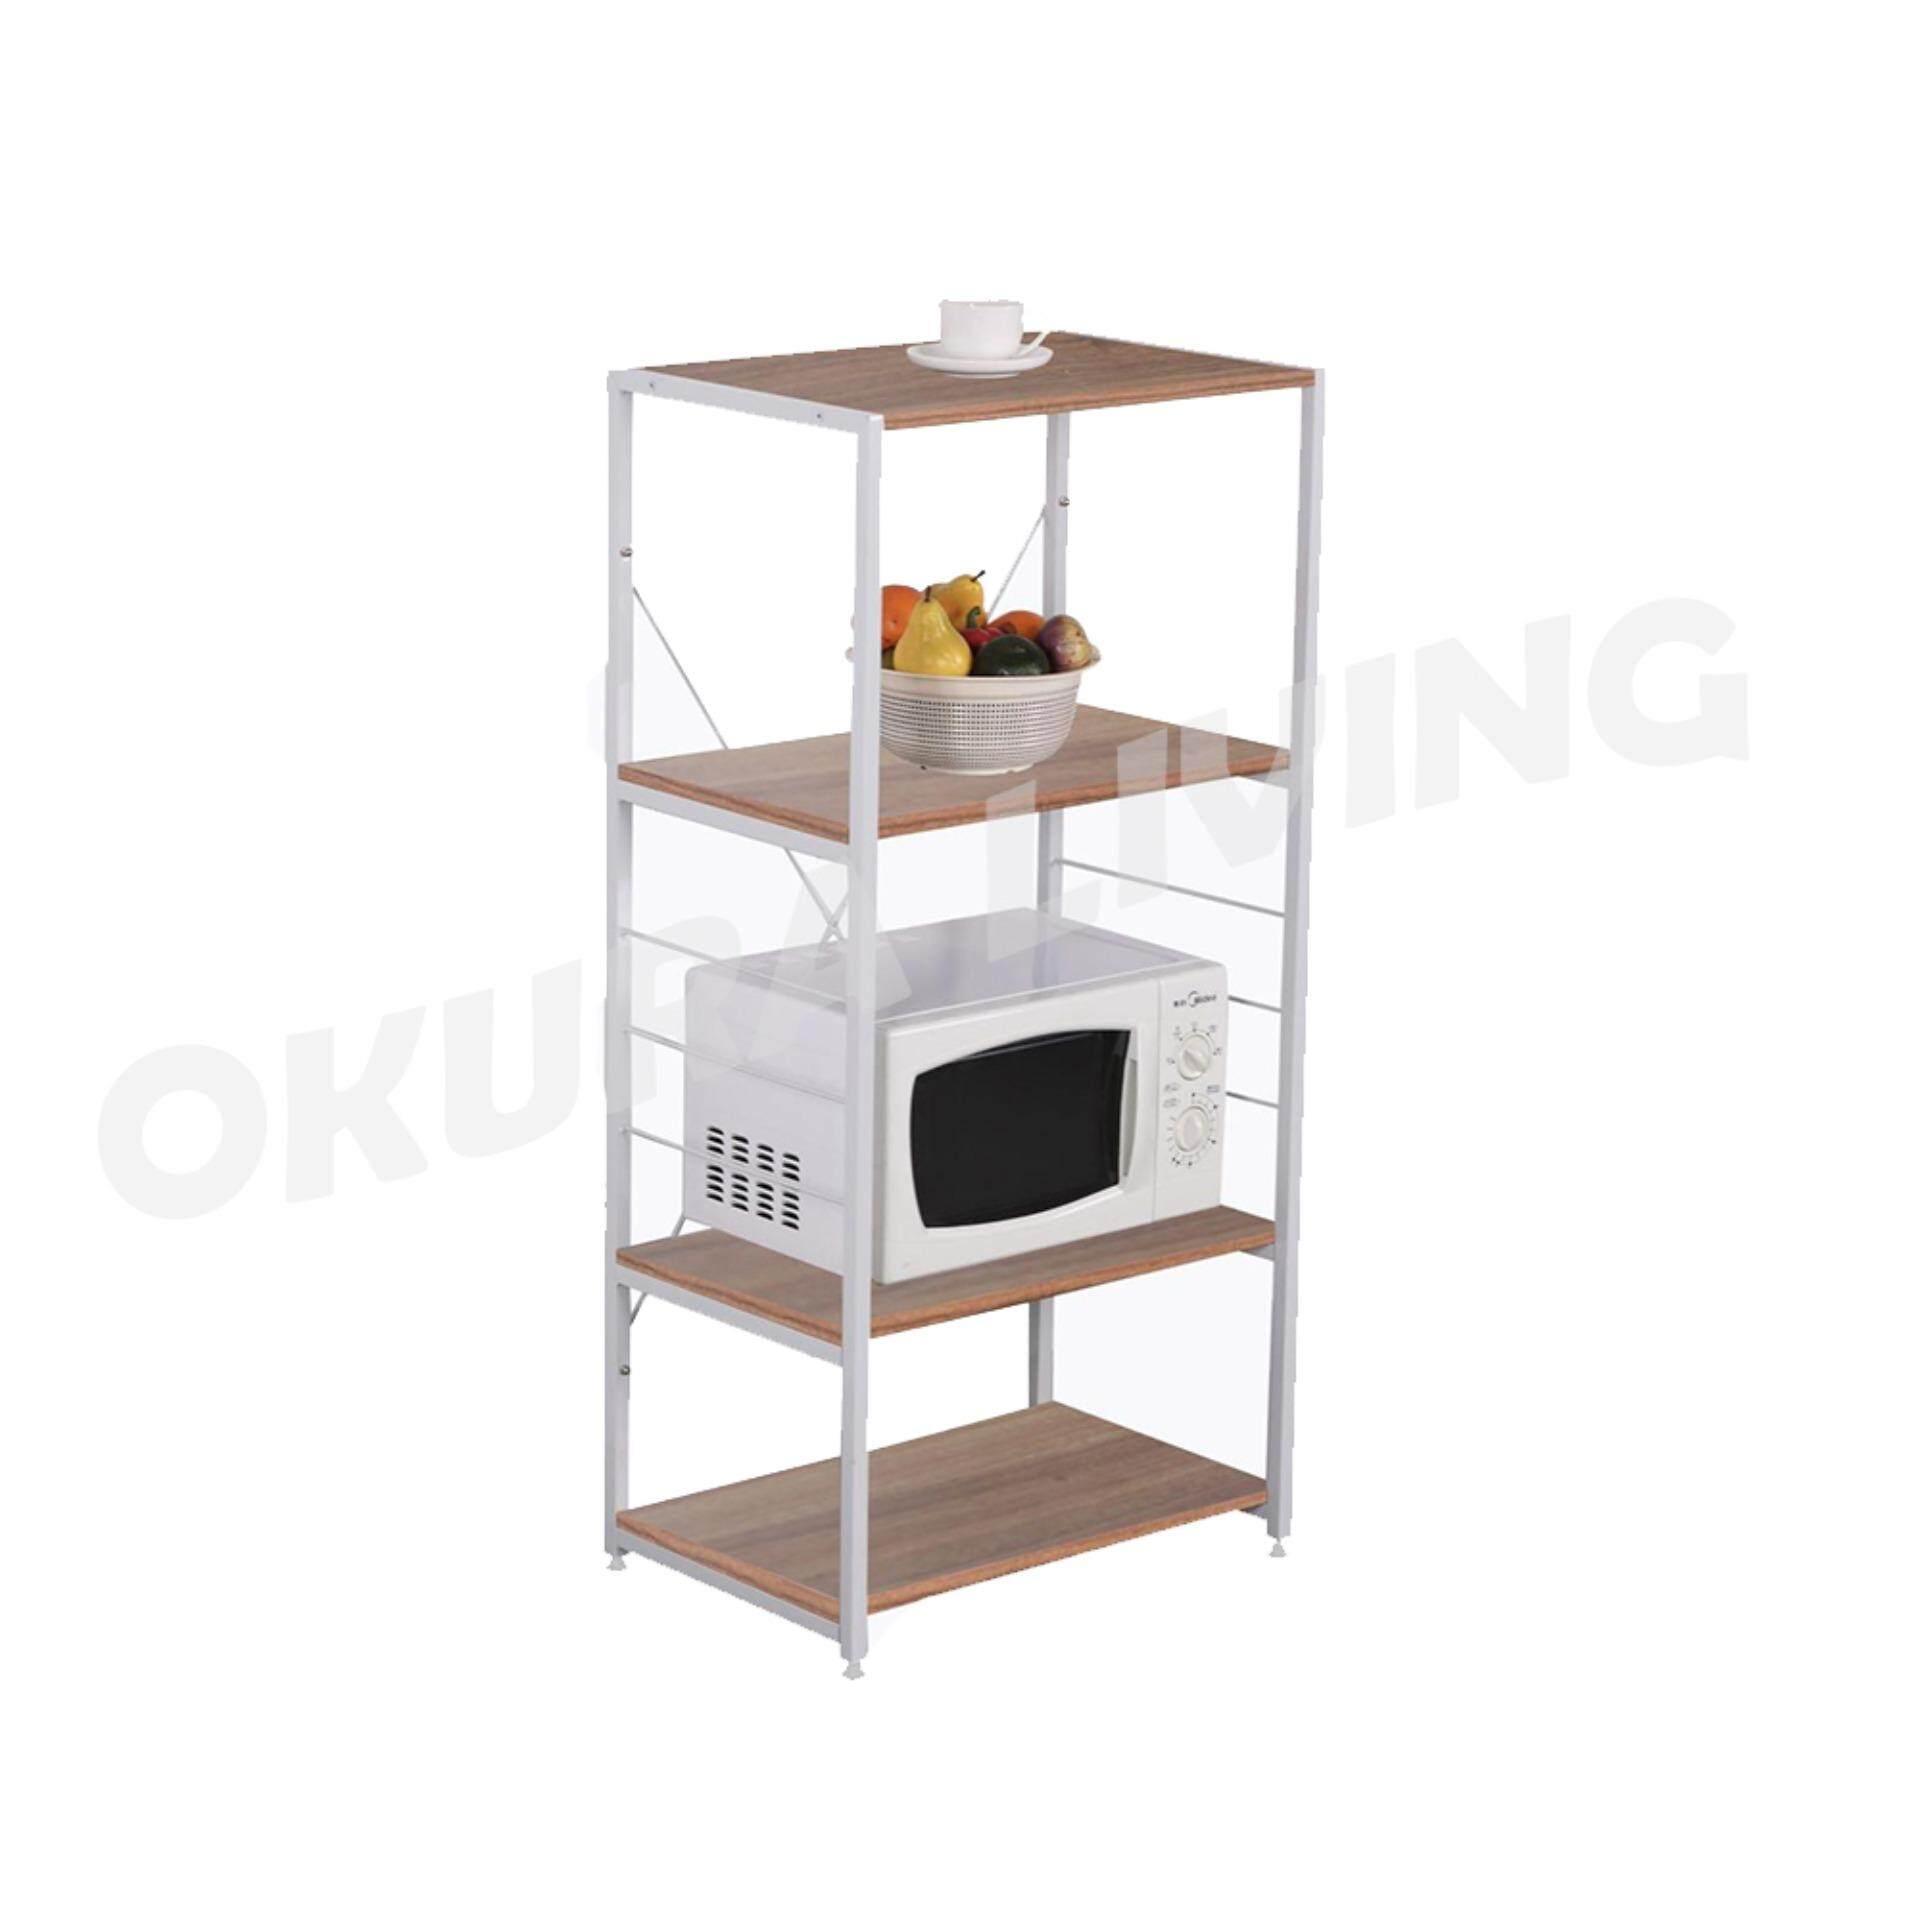 OKURA 4 Tier Multipurpose Kitchen Shelf Home Living